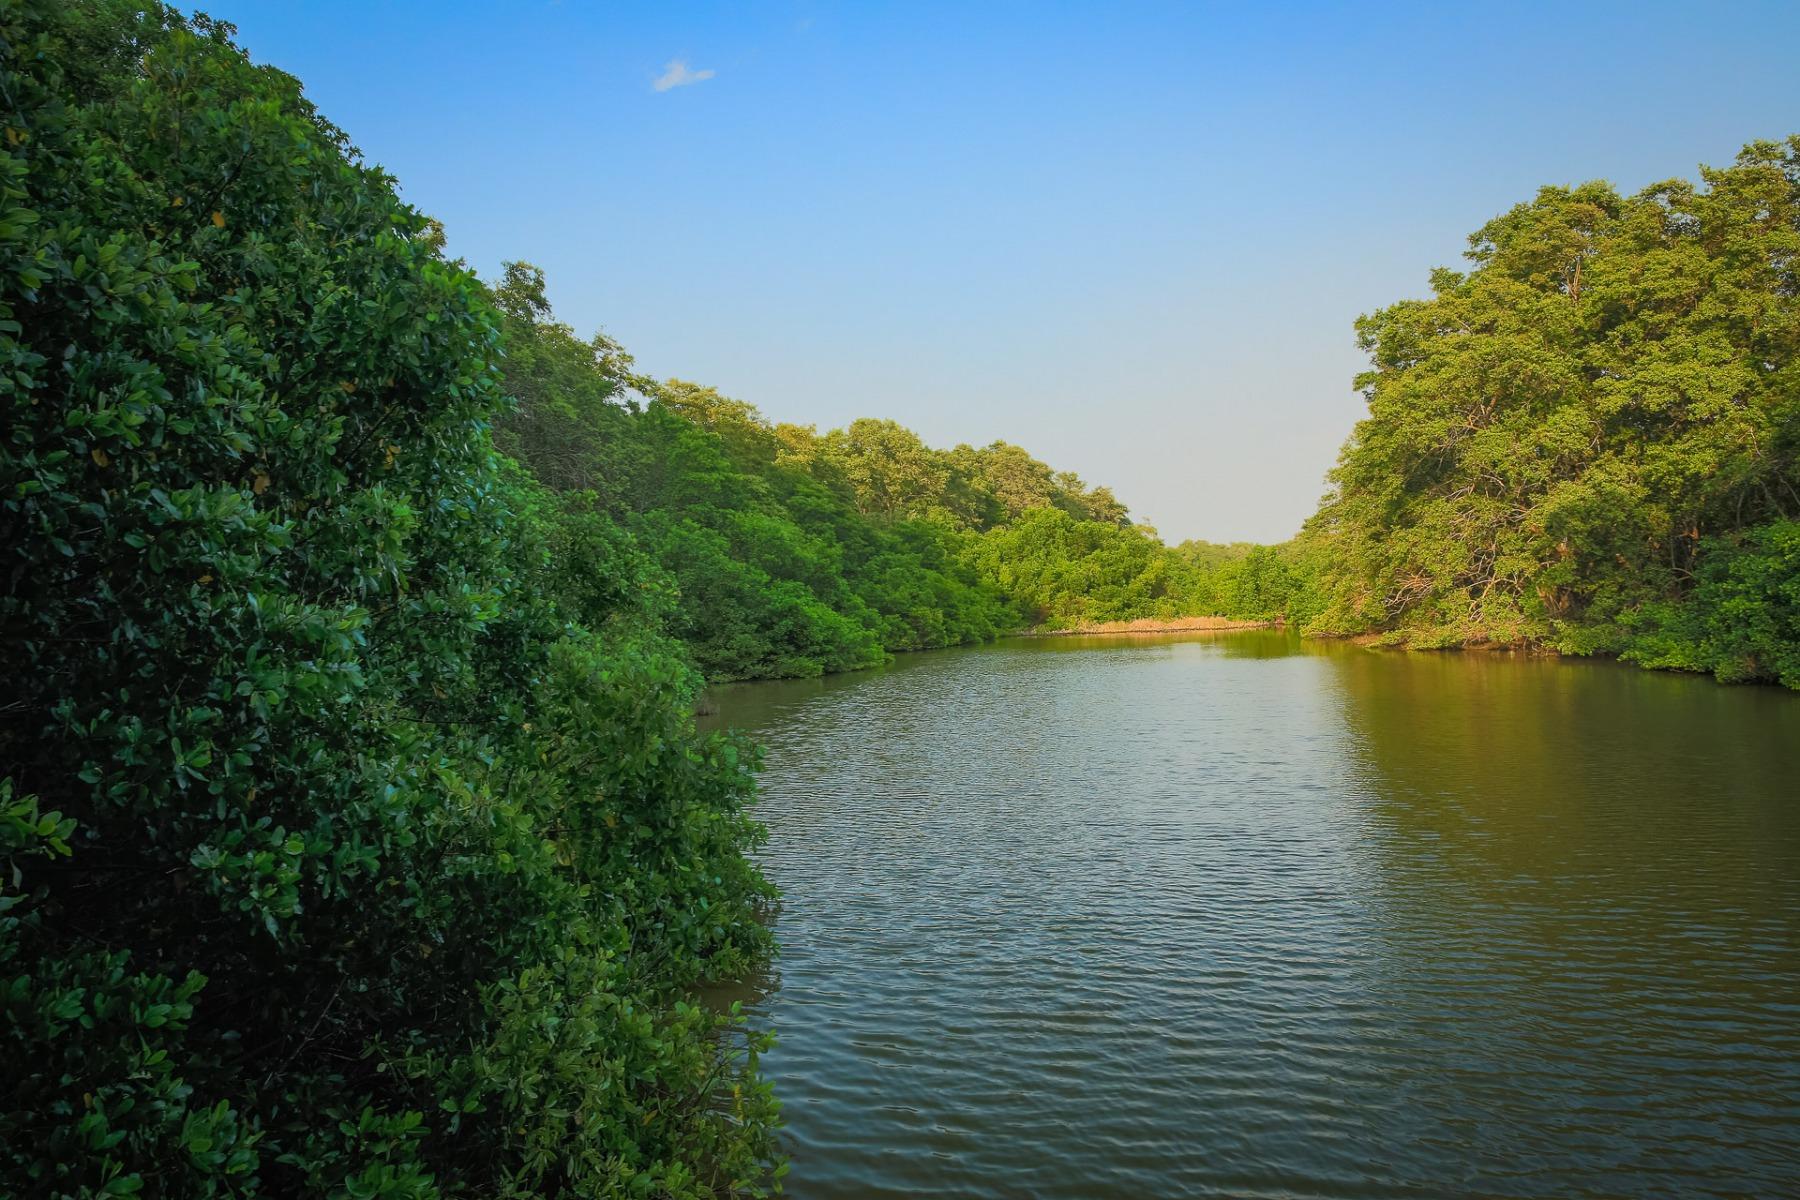 parque salamanca colombia © Tristan Quevilly